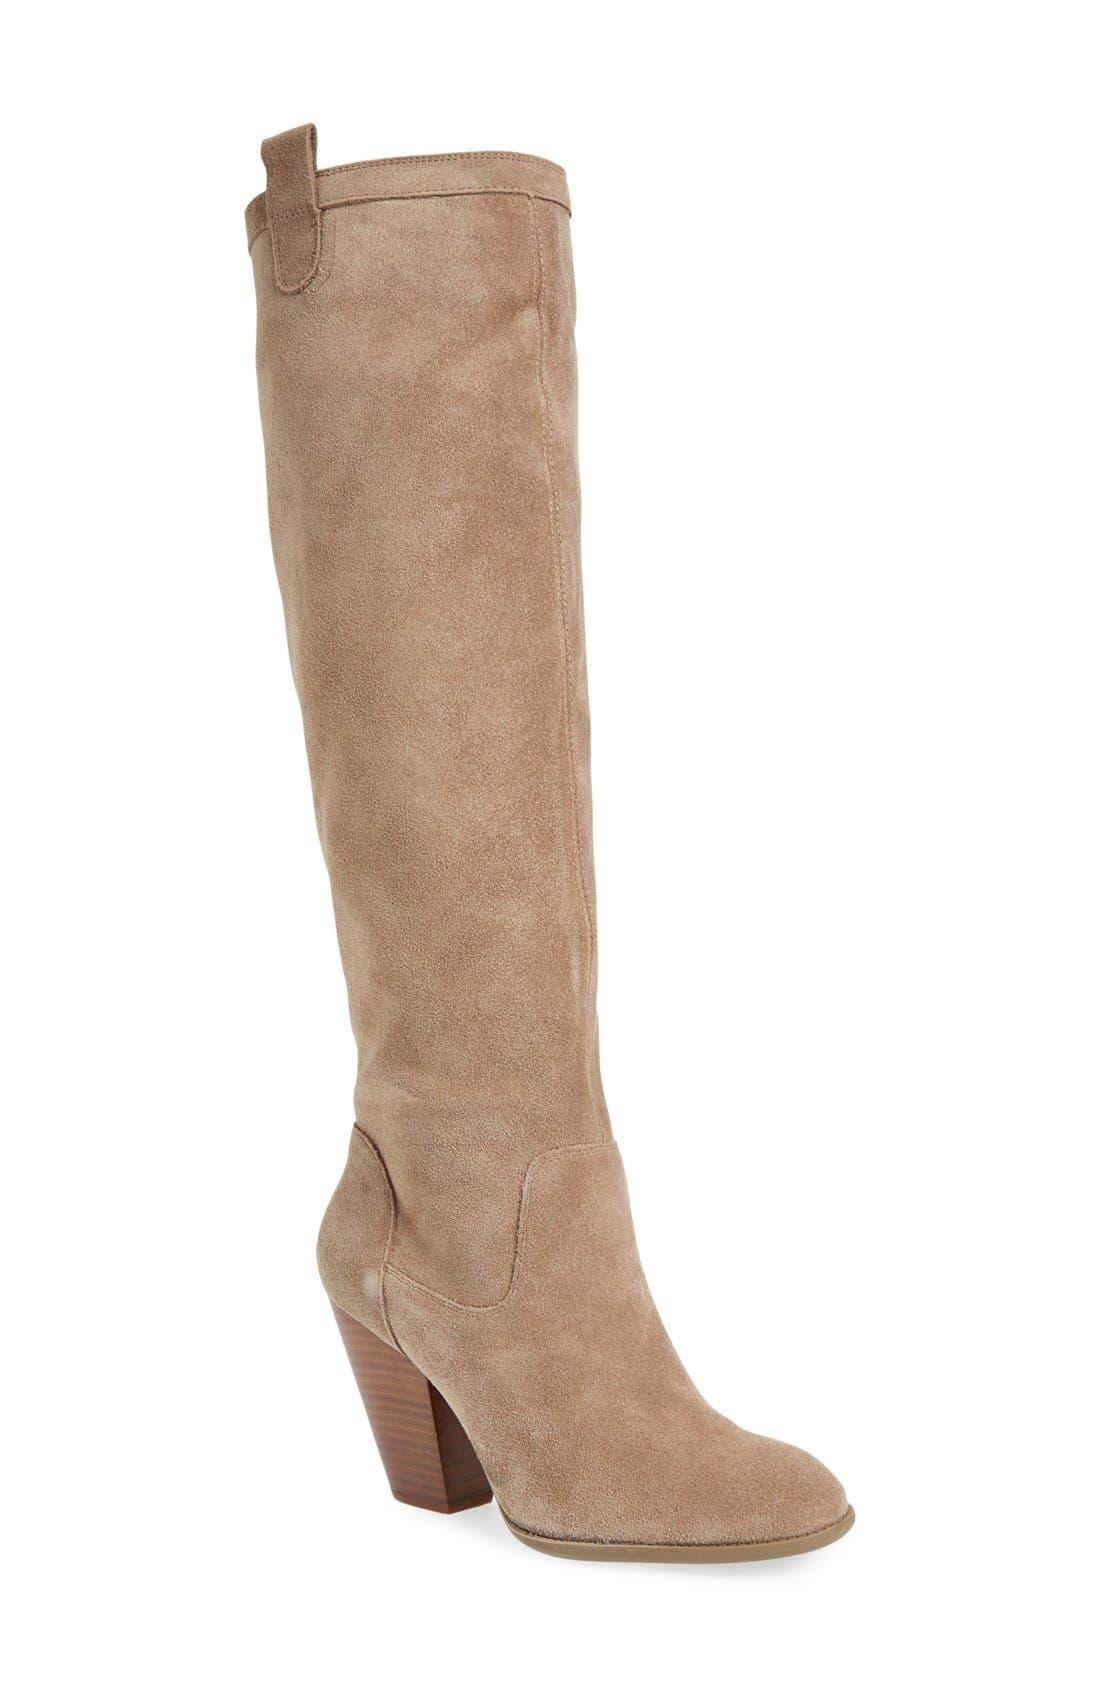 Main Image - Sole Society 'Rumer' Slouchy Knee High Boot (Women)